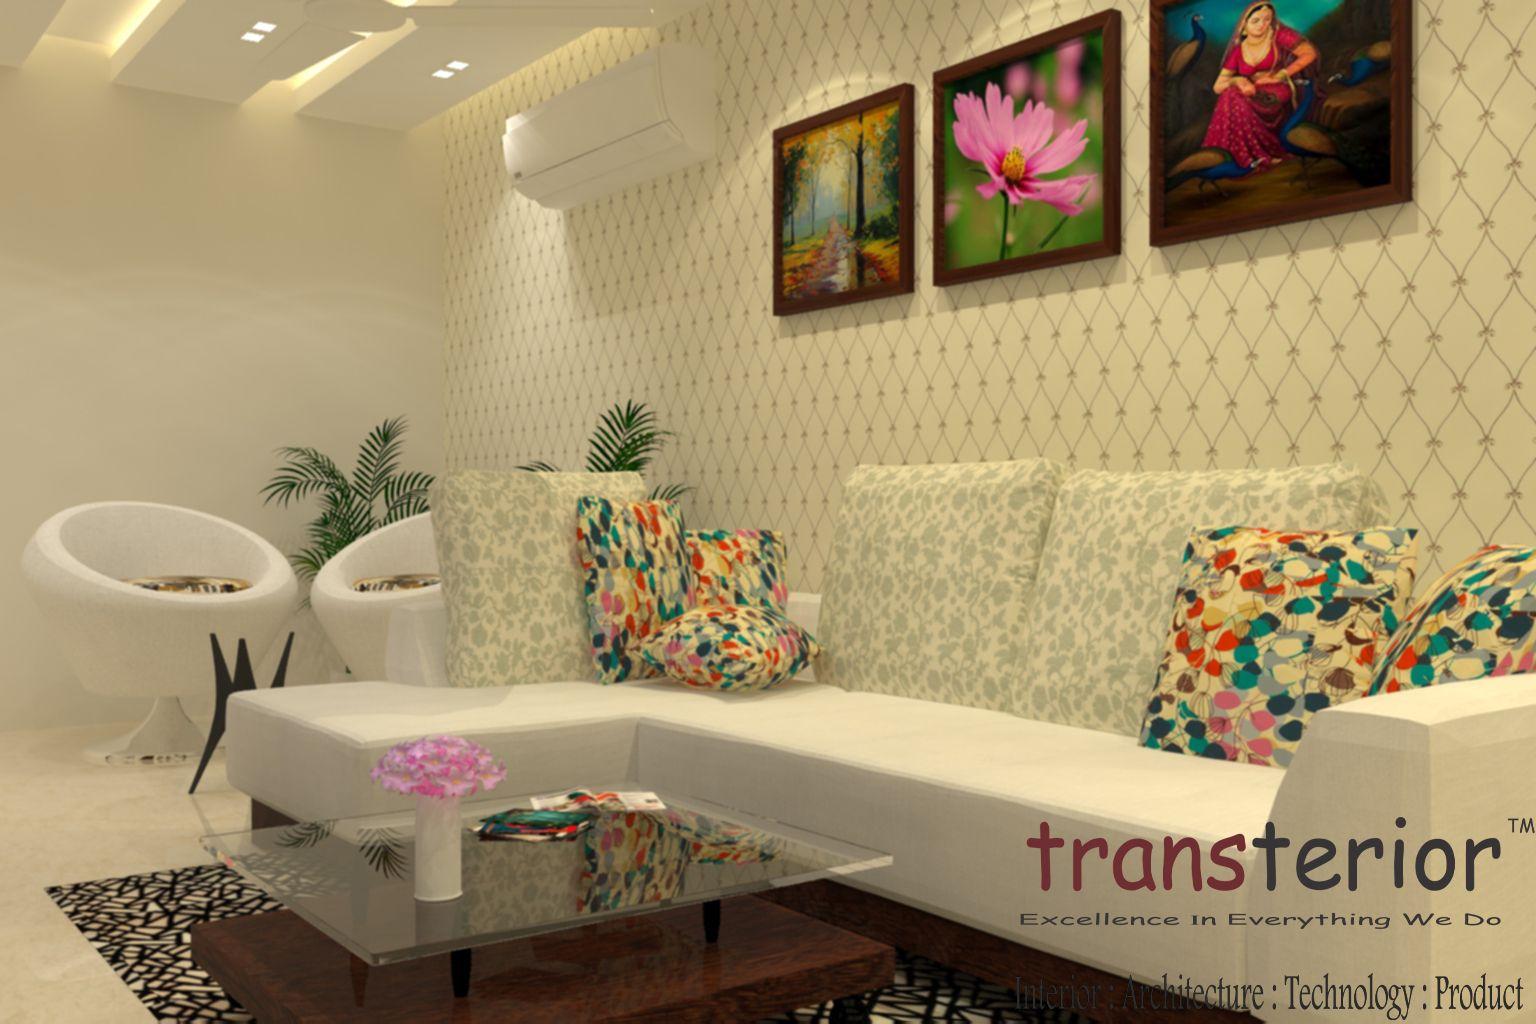 Transterior, We offer bathroom, modular kitchen, living